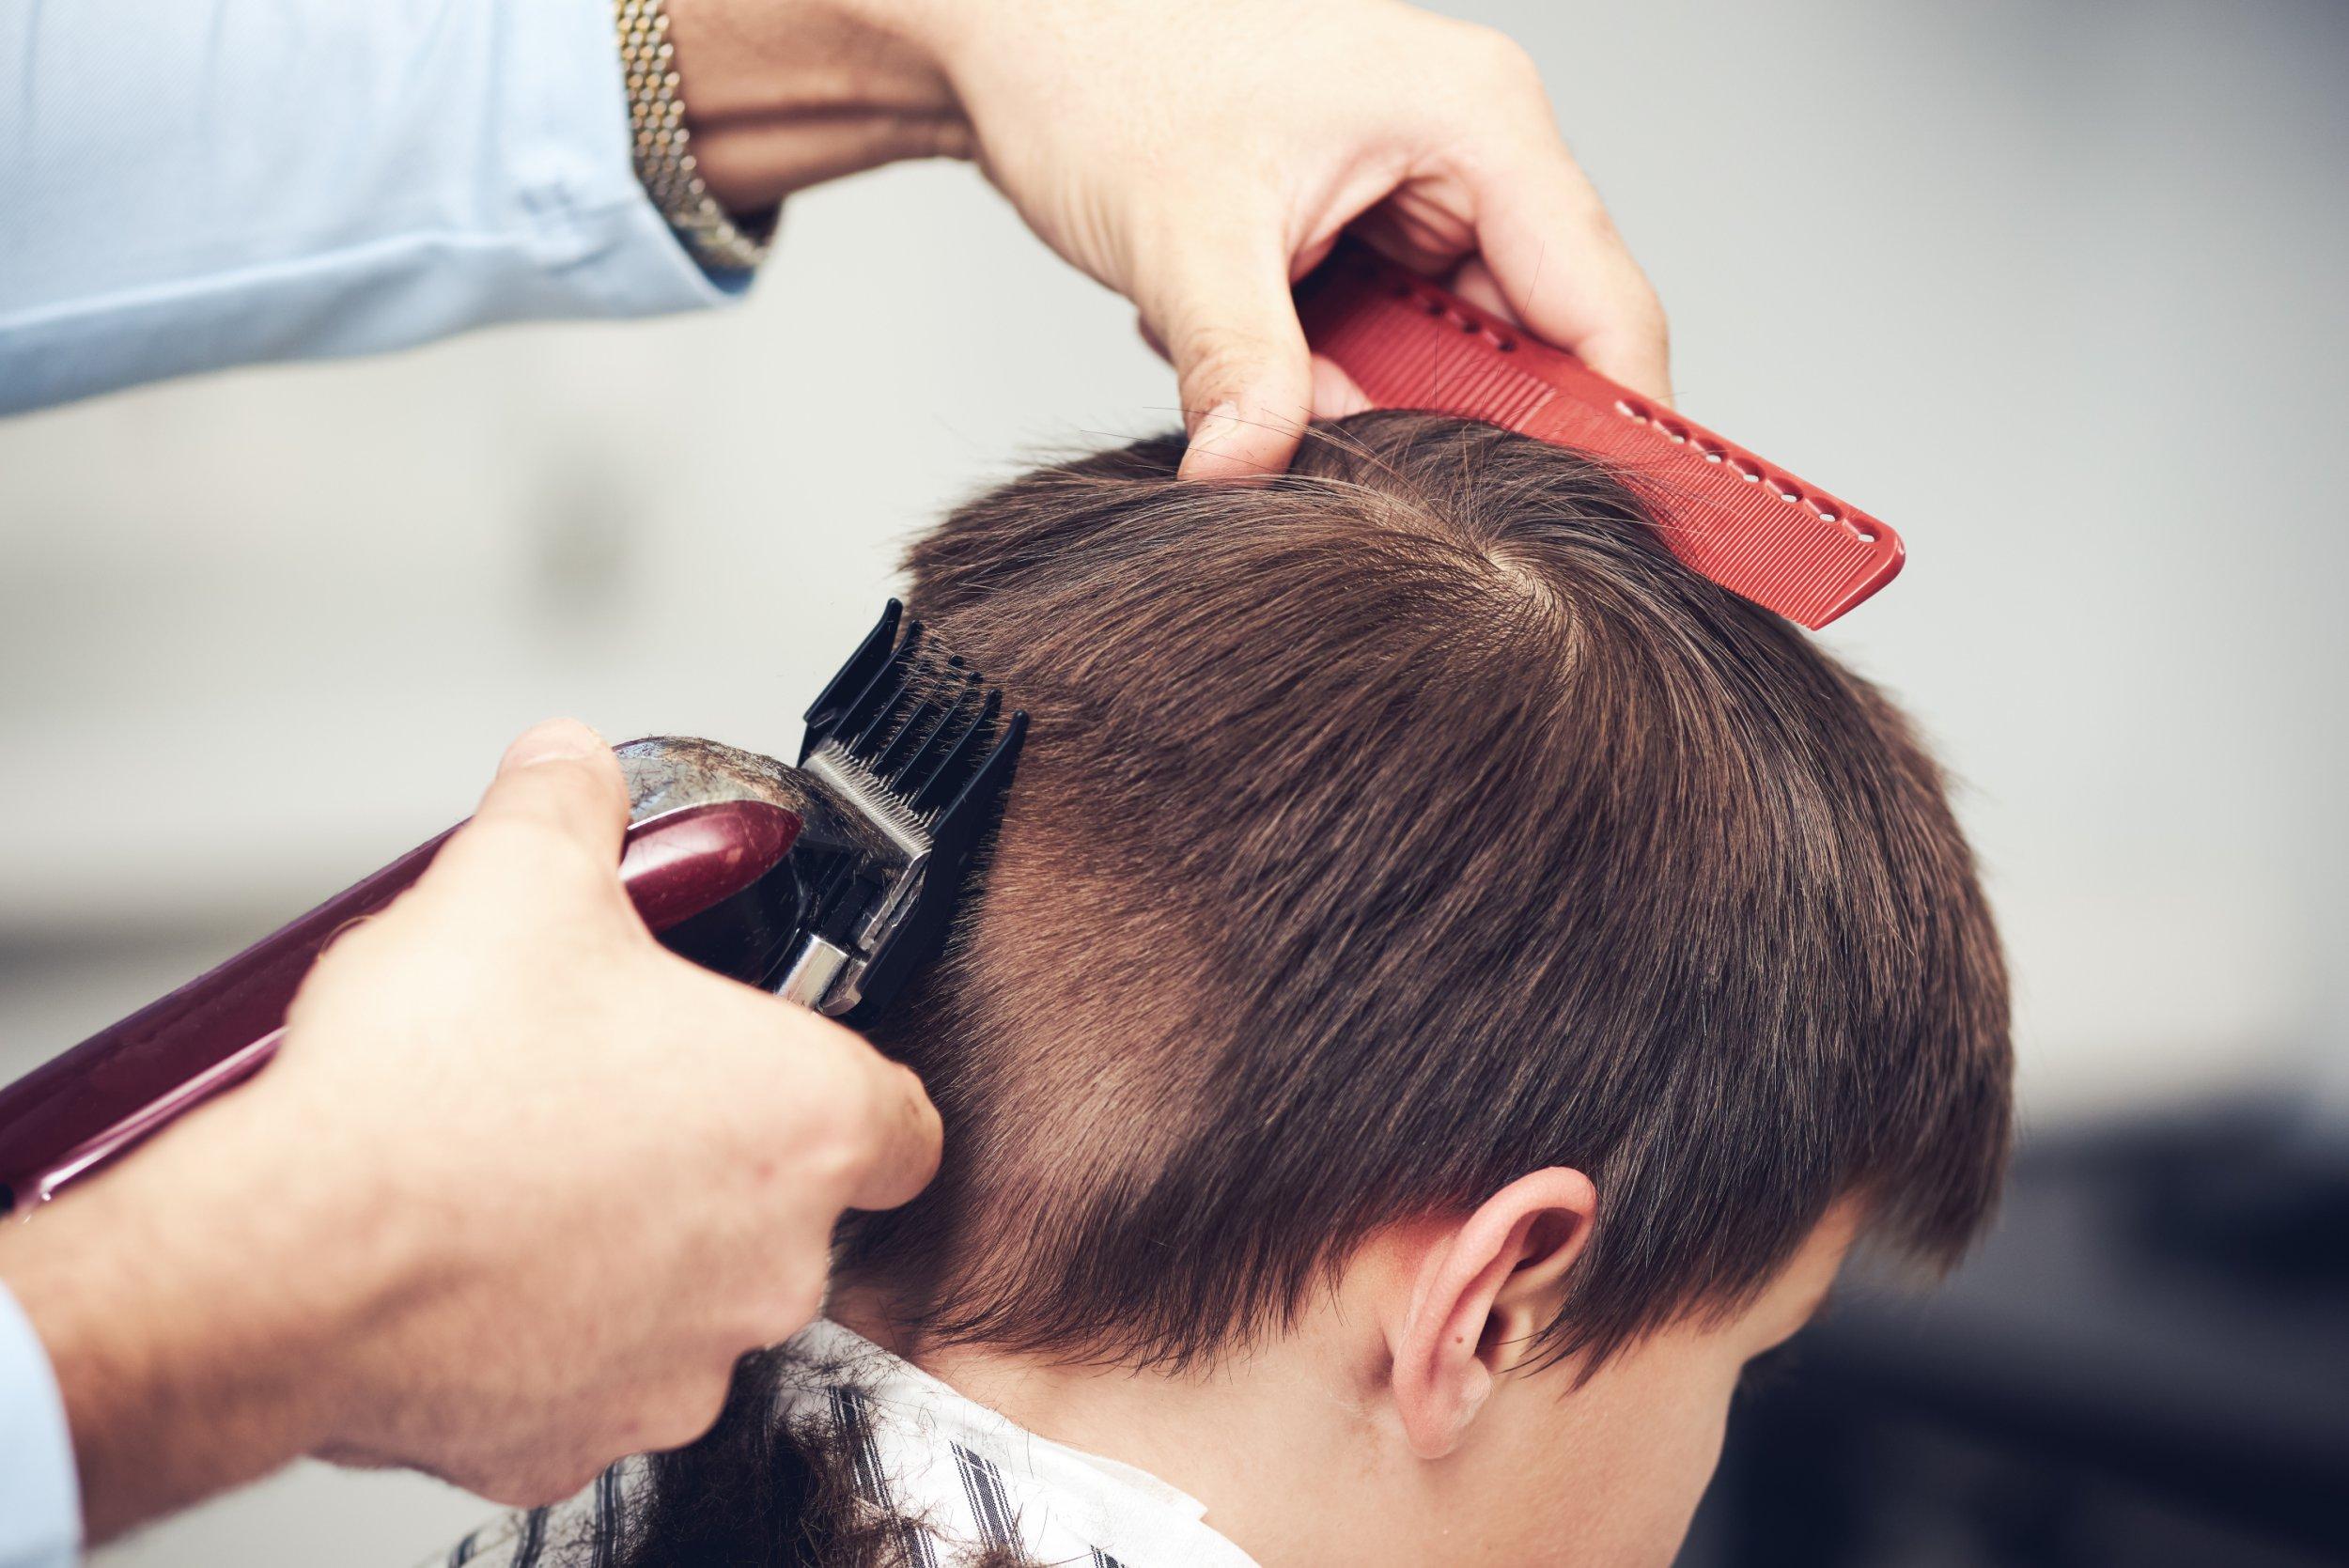 European boy getting haircut in barbershop.; Shutterstock ID 1013521075; Purchase Order: -